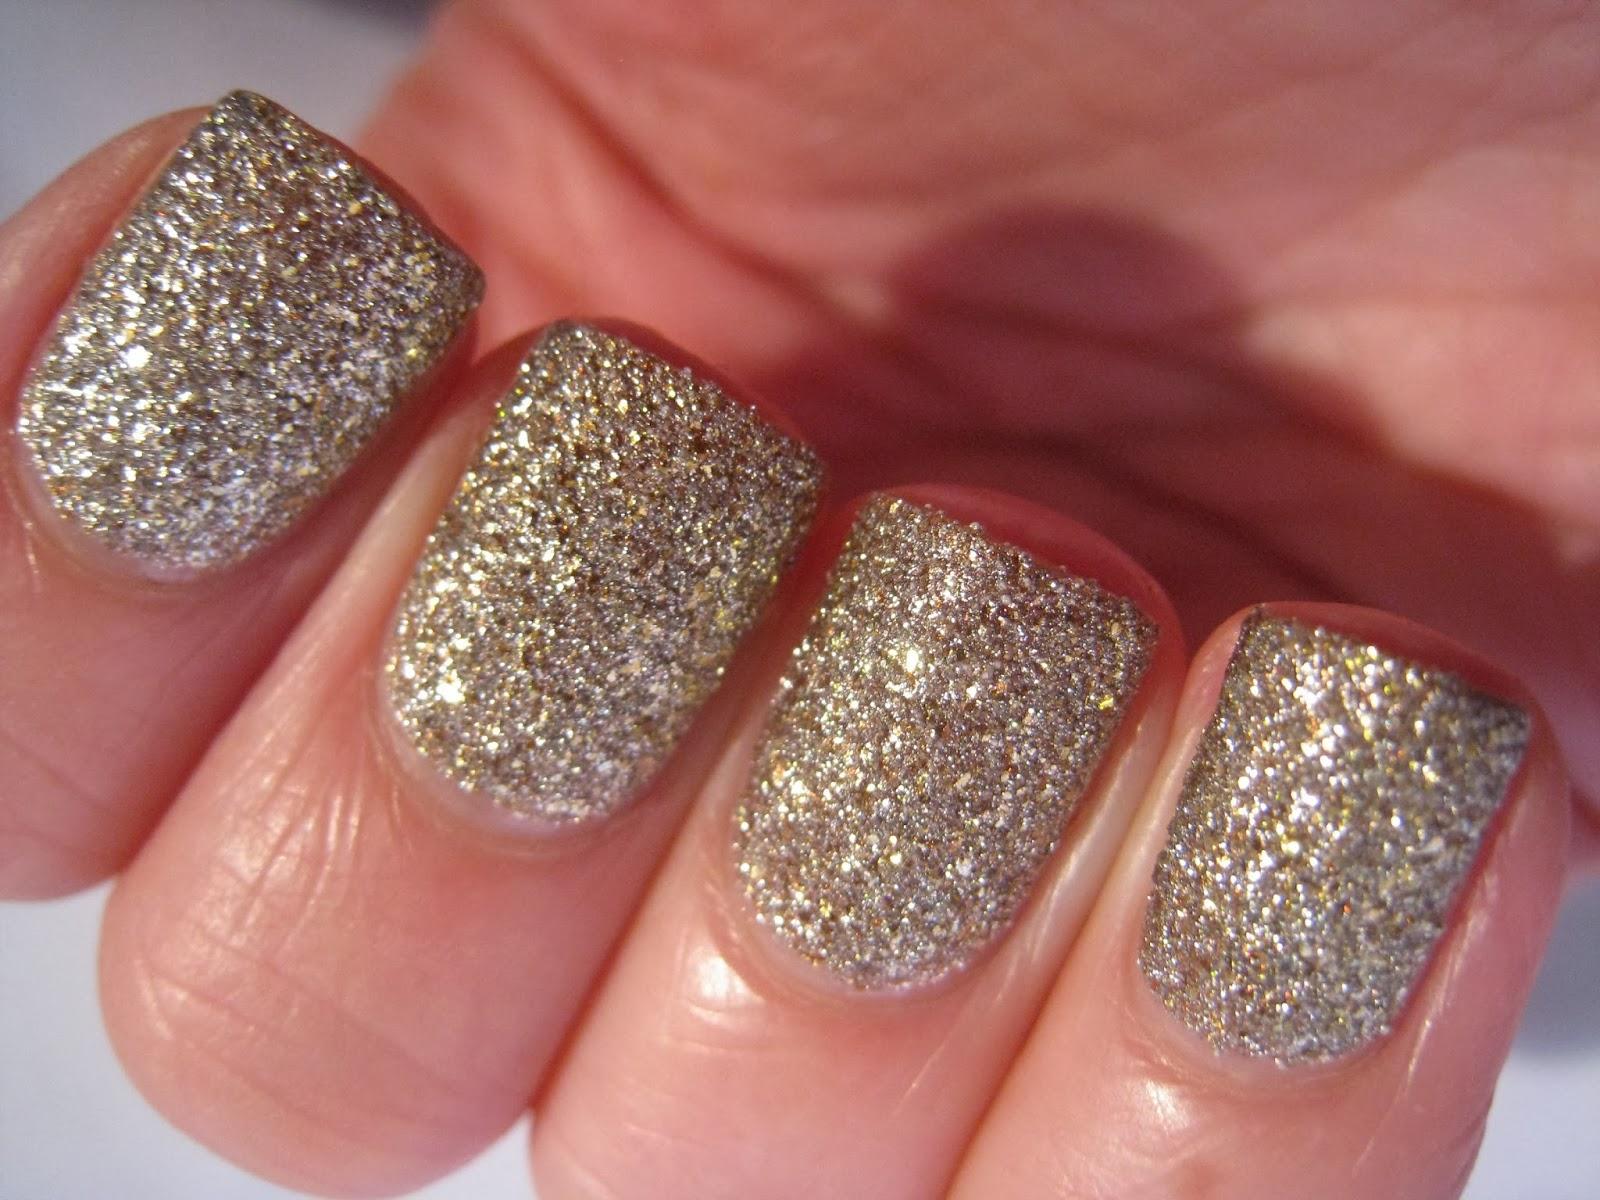 Boots-Seventeen-Charm-Bracelet-Textured-gold-nail-polish